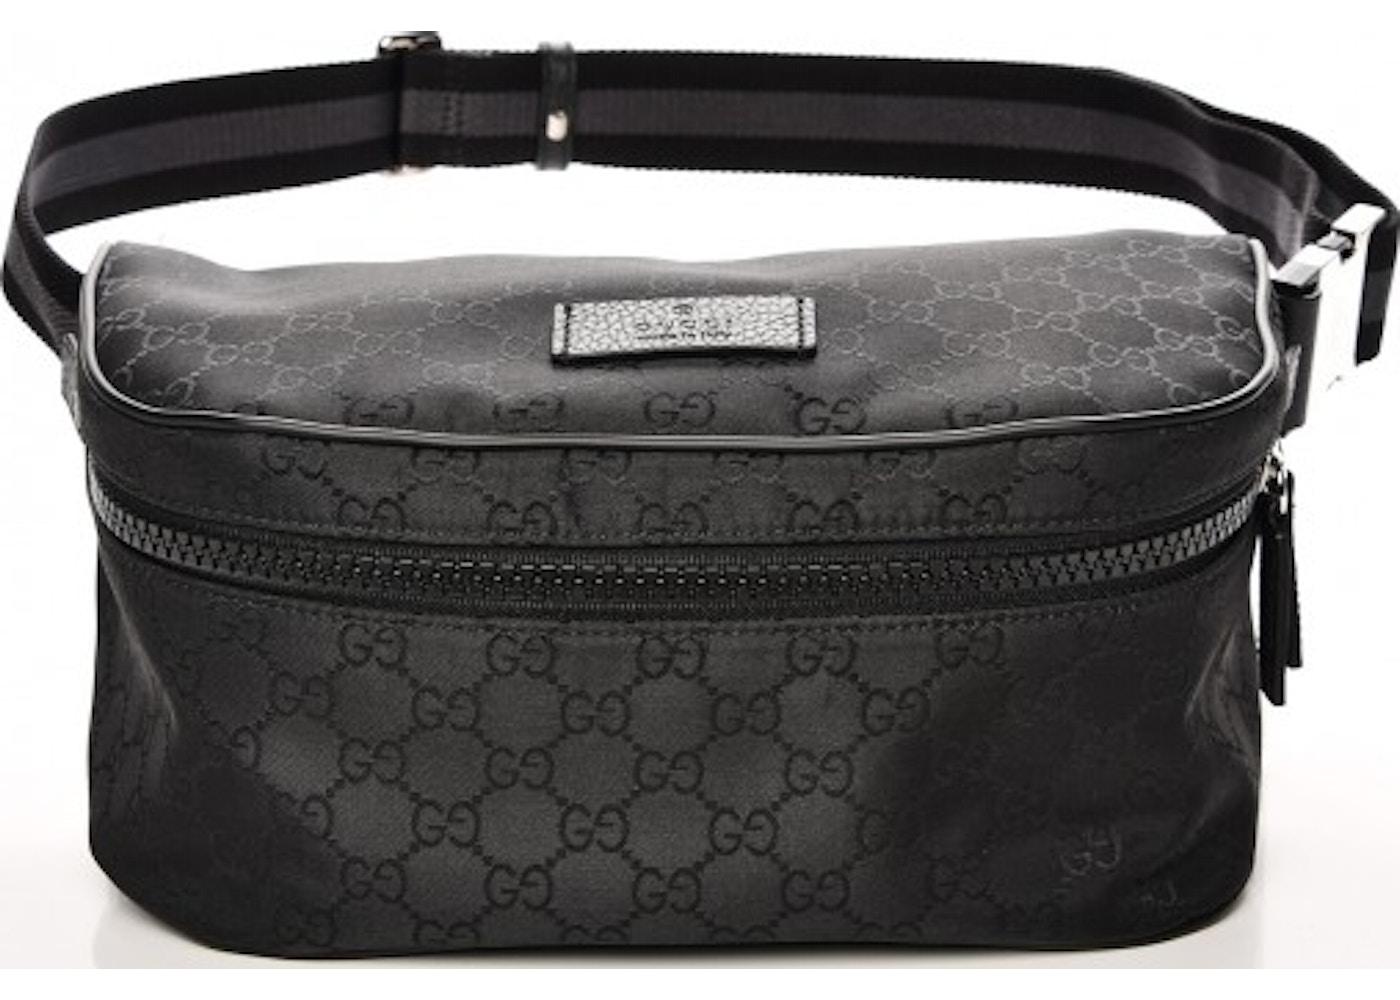 ebf23e4c05f Gucci Fanny Waist Bag Monogram GG Web Strap Black